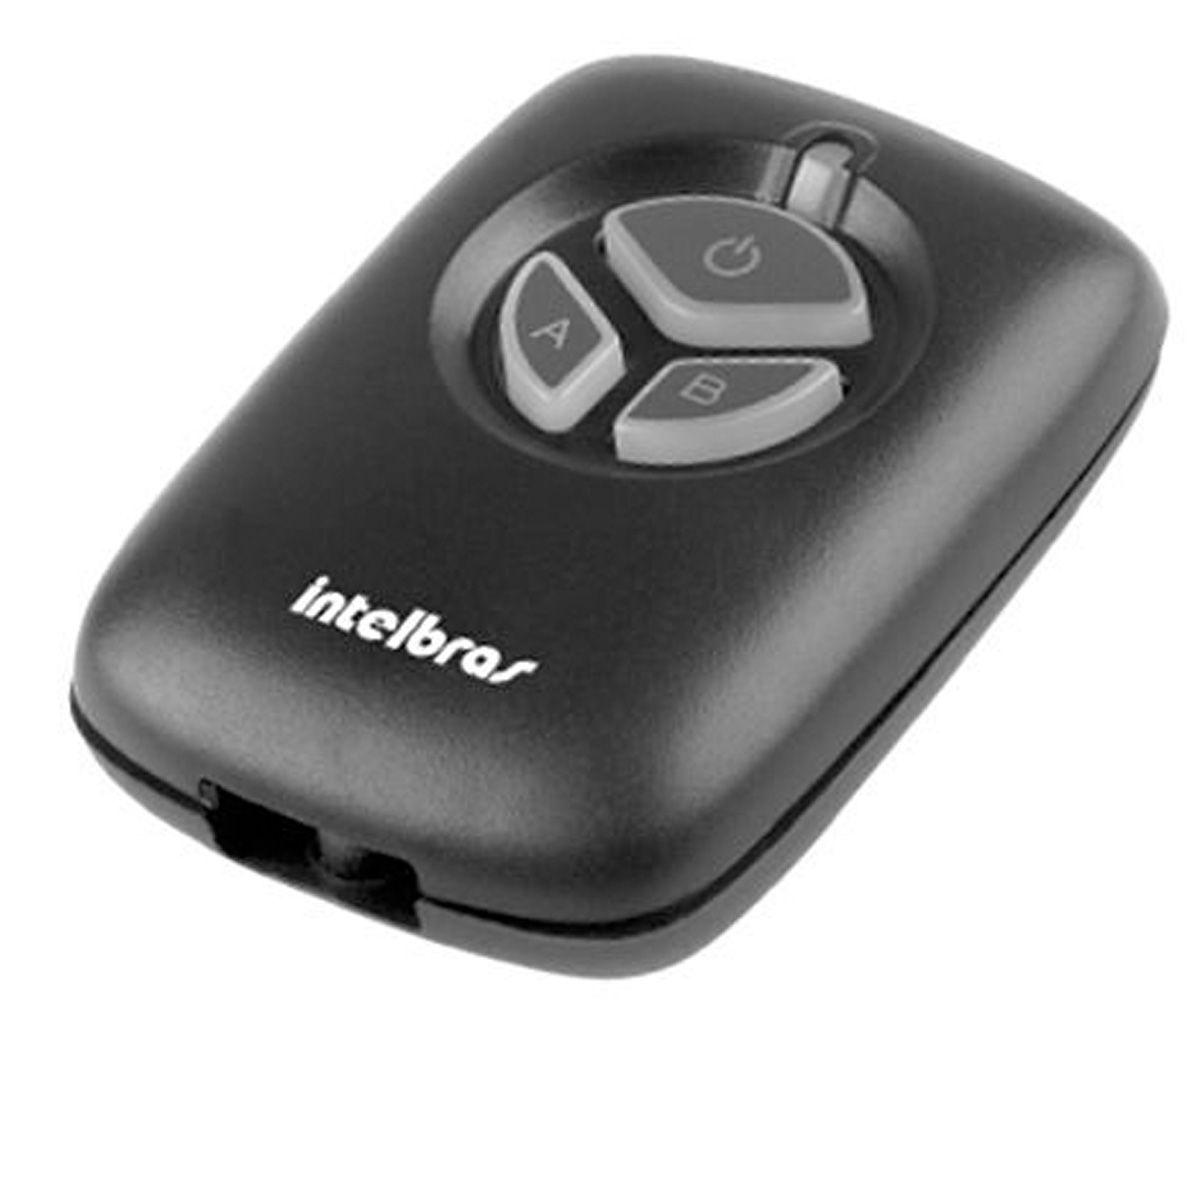 Kit de Controle Intelbras Com 02 Controle Remoto Intelbras XAC 2000TX Preto